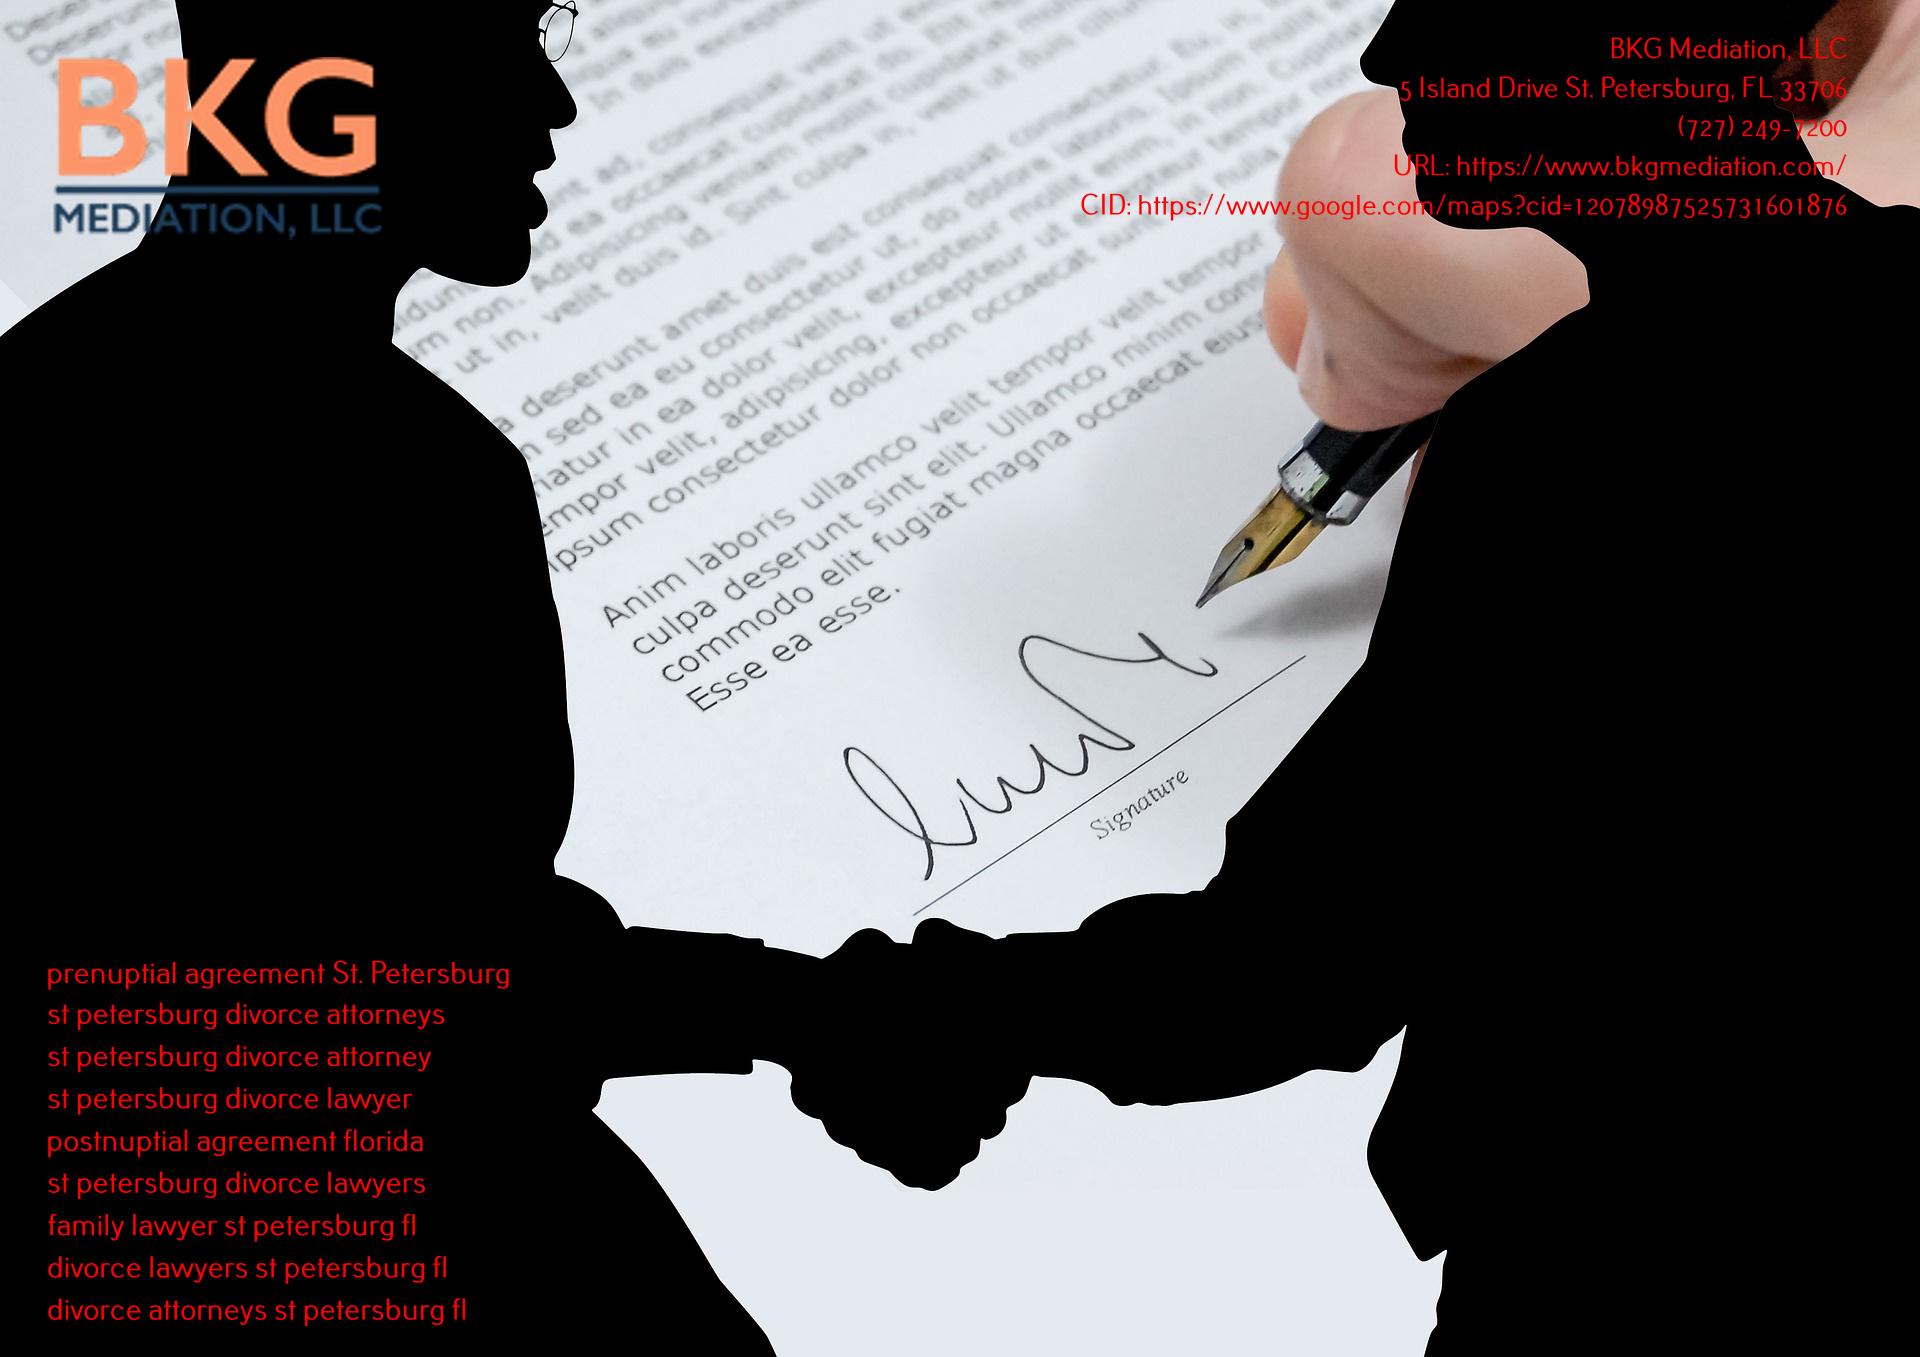 BKG Mediation, LLC St. Petersburg Introduces Prenuptial Agreement St. Petersburg